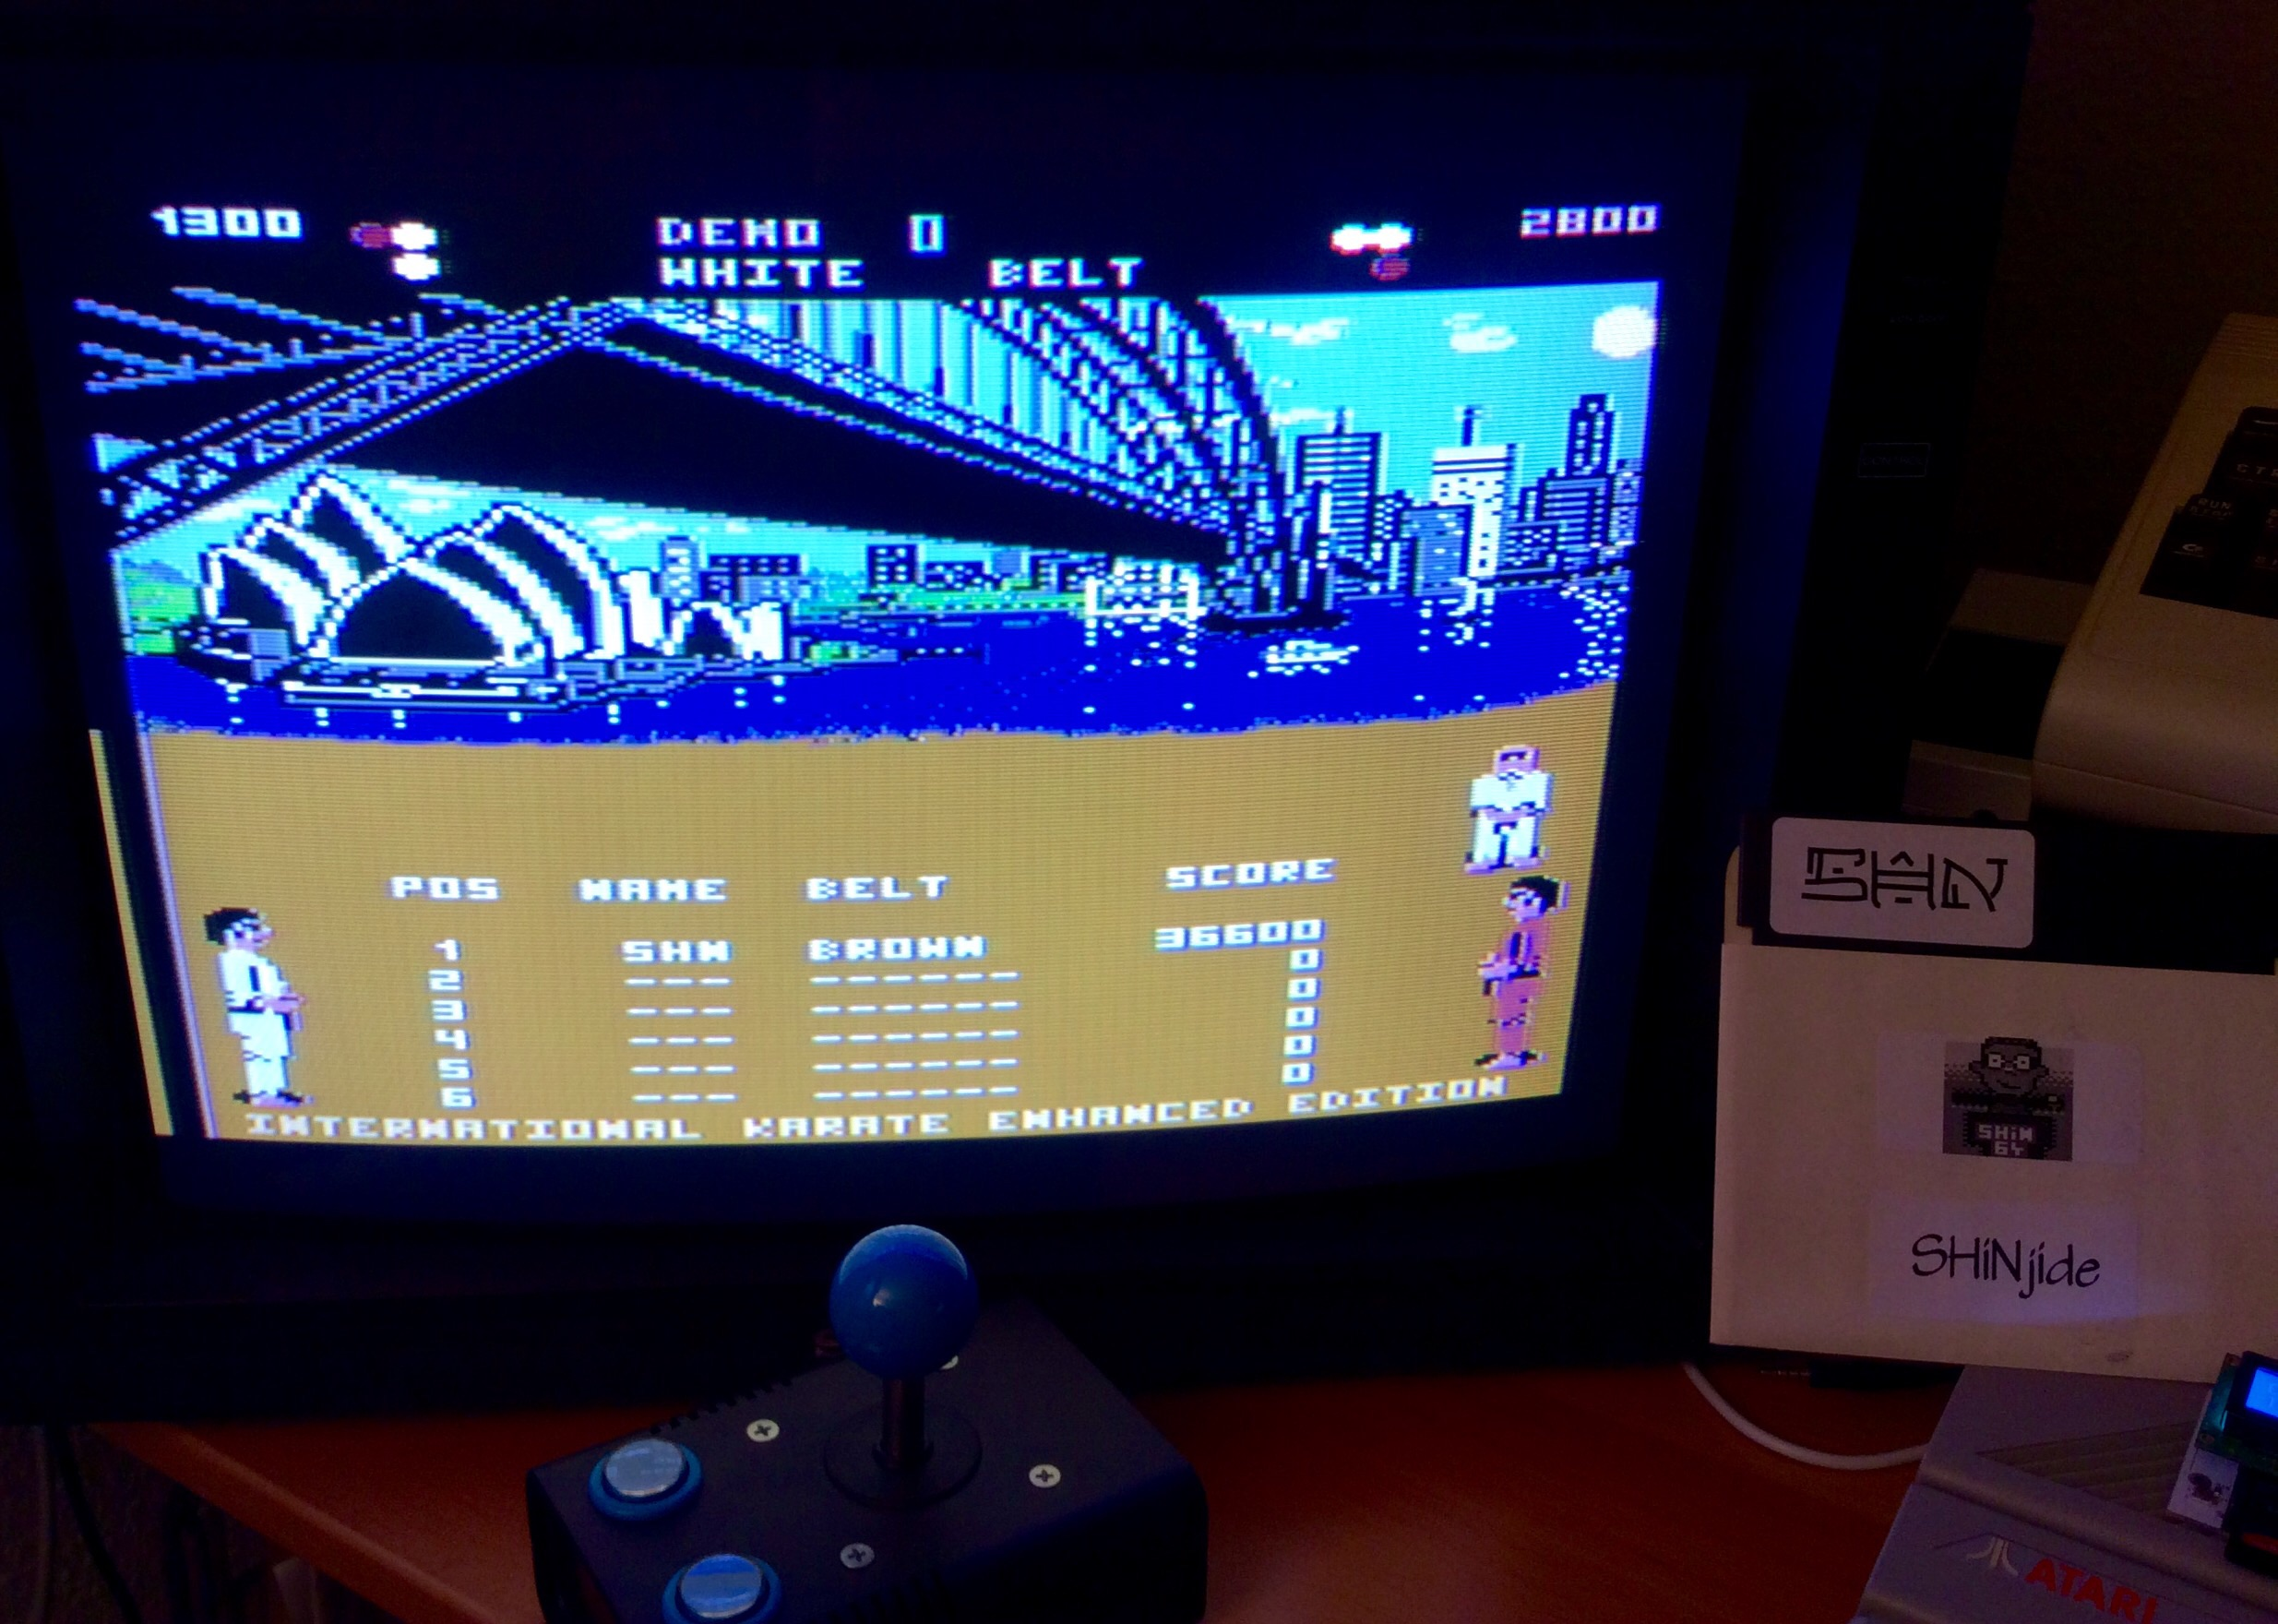 SHiNjide: International Karate Enhanced Edition (Atari 400/800/XL/XE) 36,600 points on 2015-01-17 09:18:46